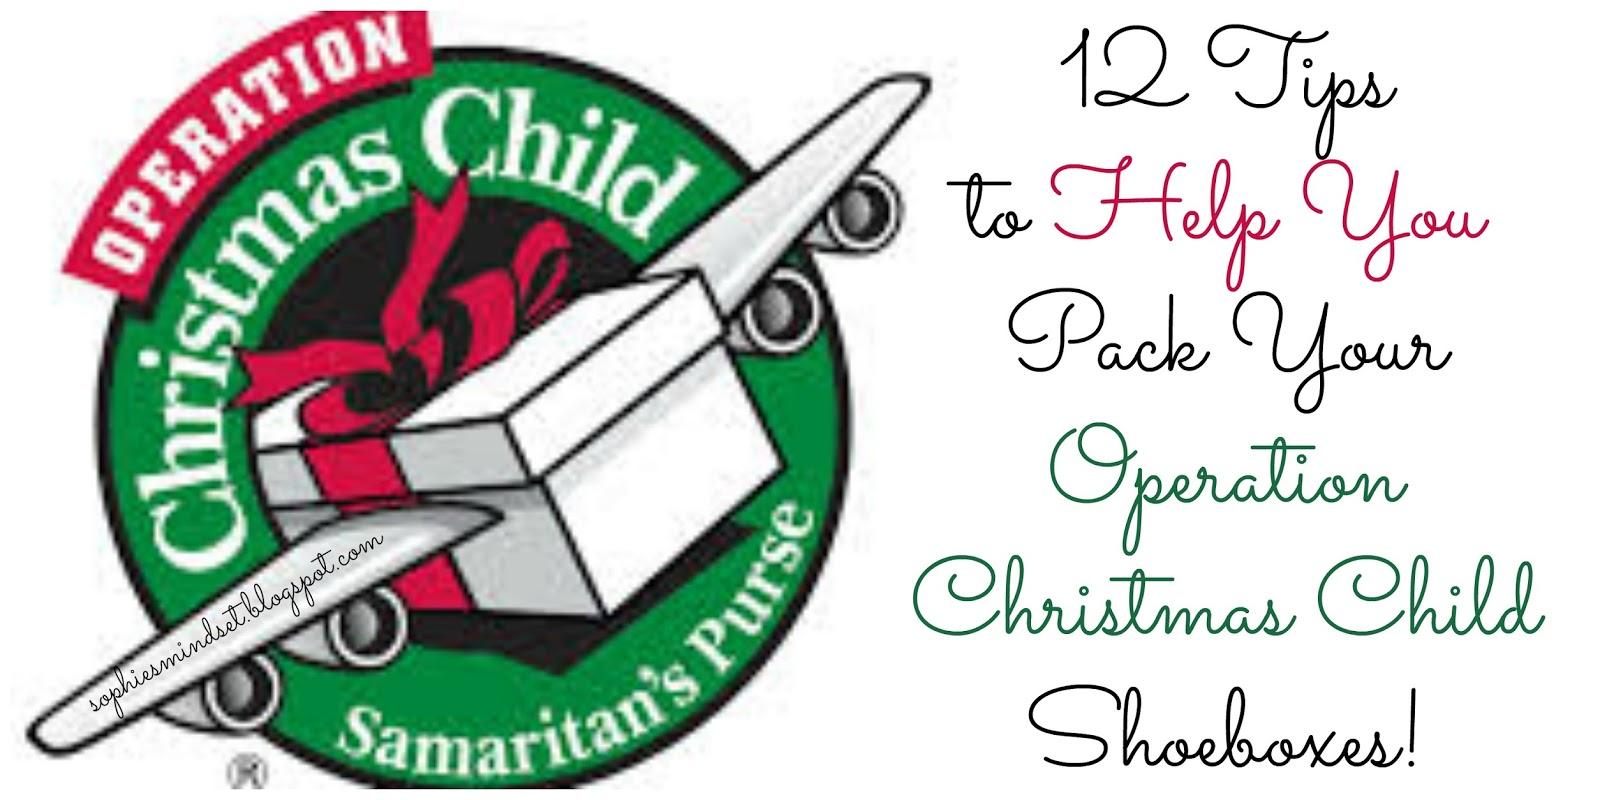 Operation Christmas Child Shoebox Clip Art.Sophie S Mindset 12 Tips For Operation Christmas Child